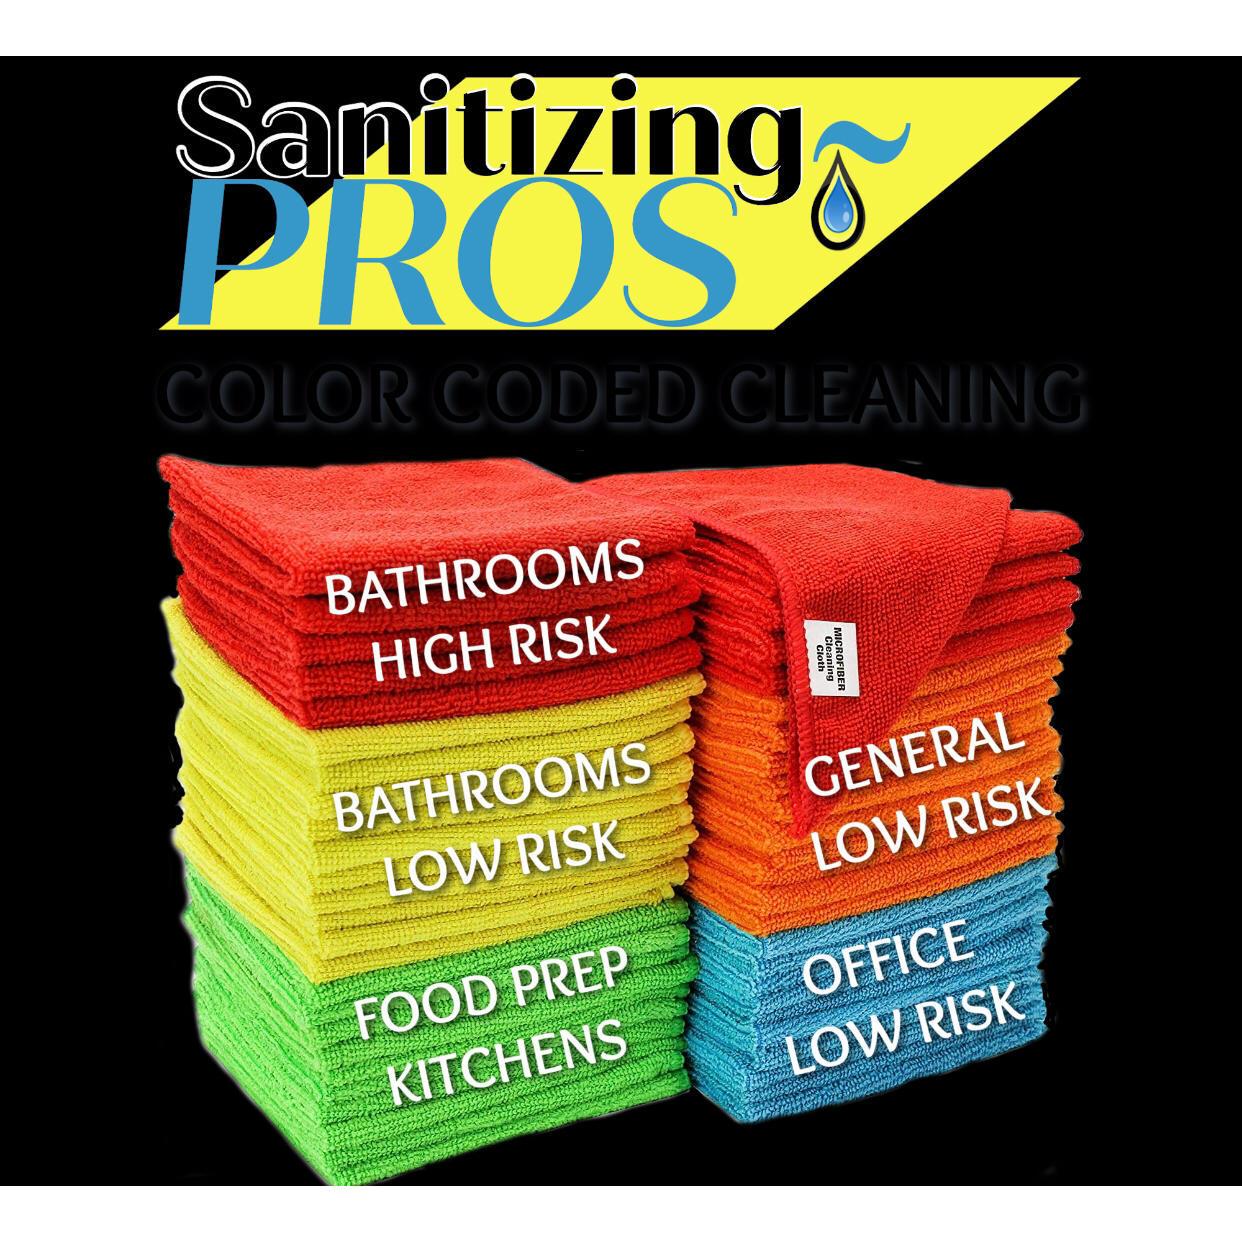 Sanitizing-Pros